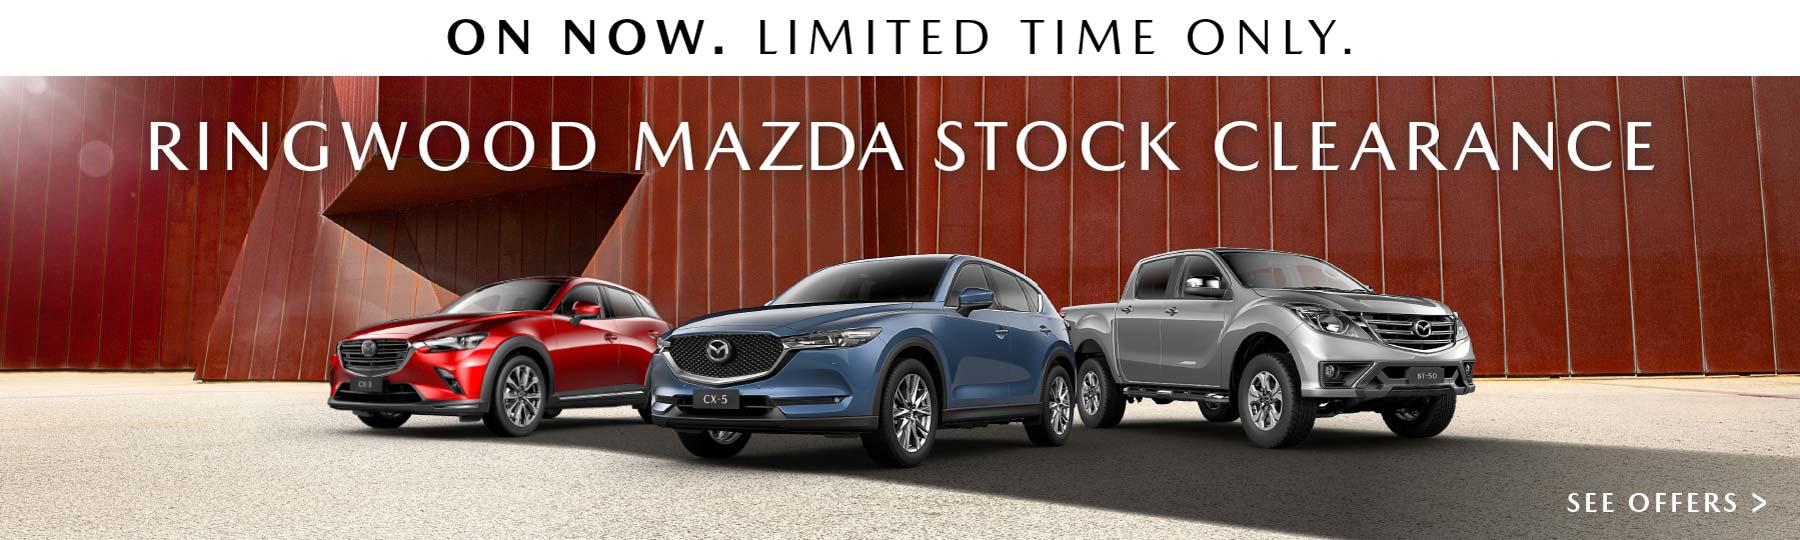 Ringwood Mazda Stock Clearance December